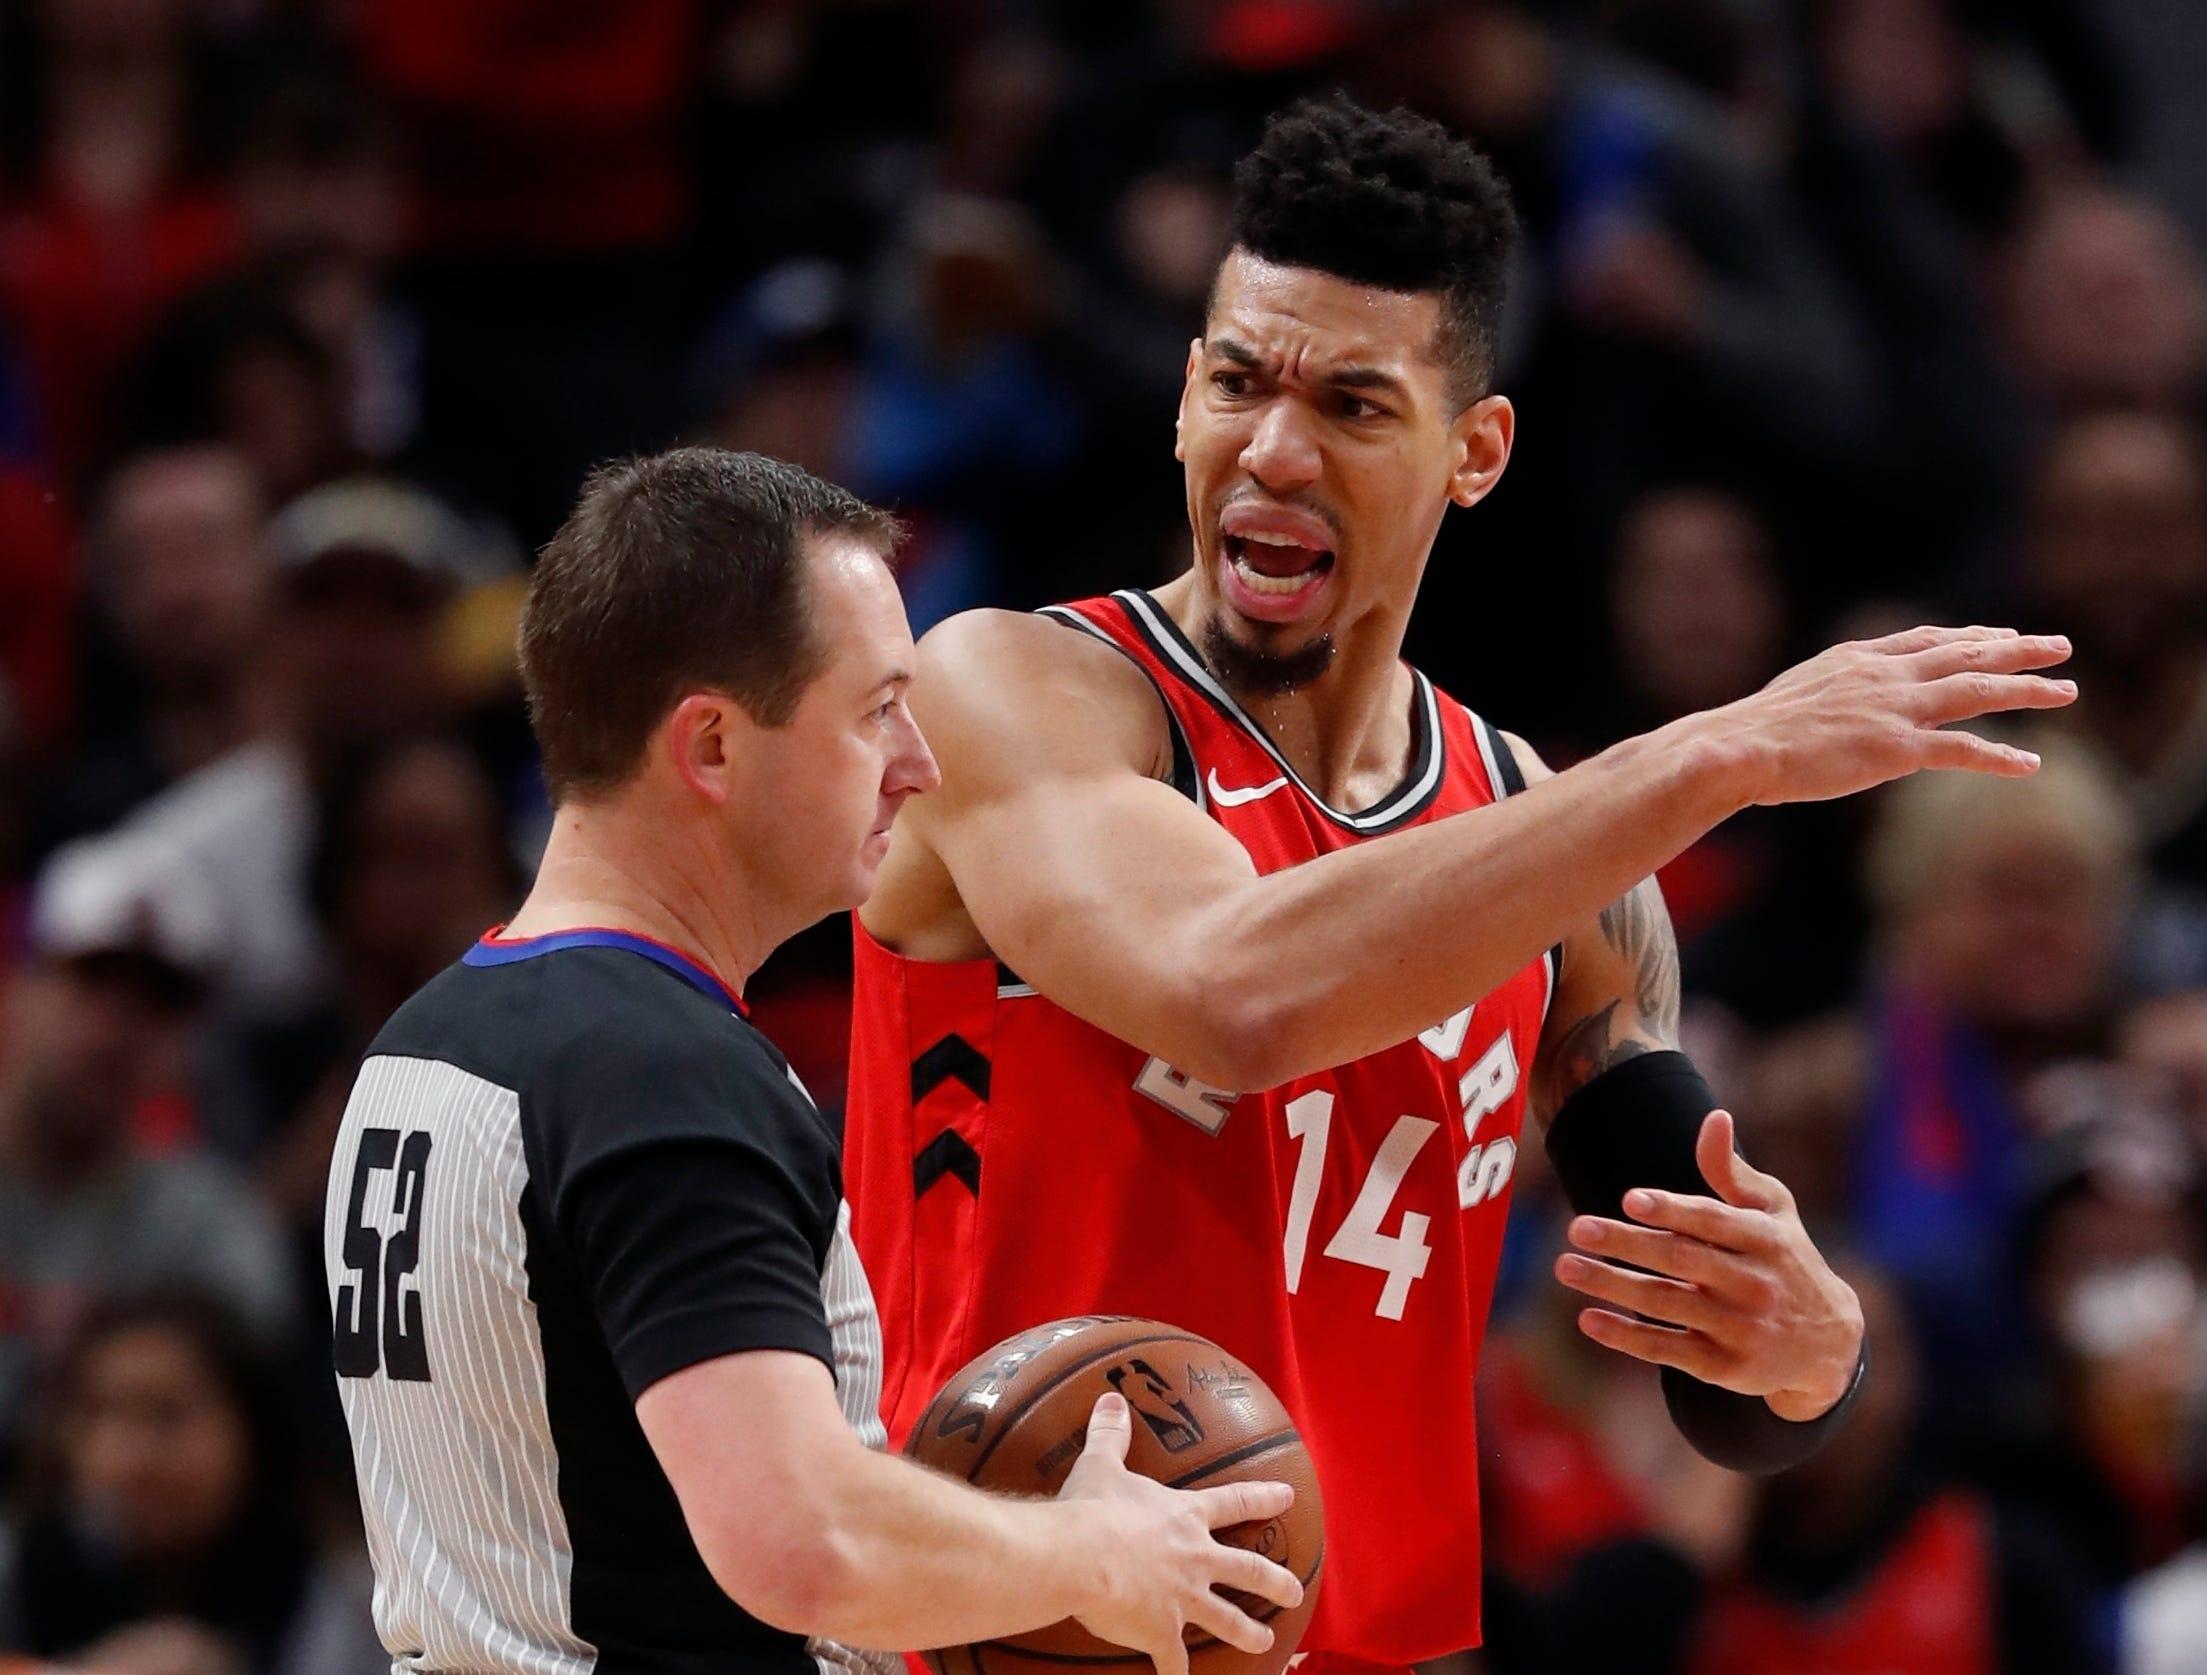 Toronto Raptors guard Danny Green (14) argues a technical with referee Scott Twardoski (52) during the second half.